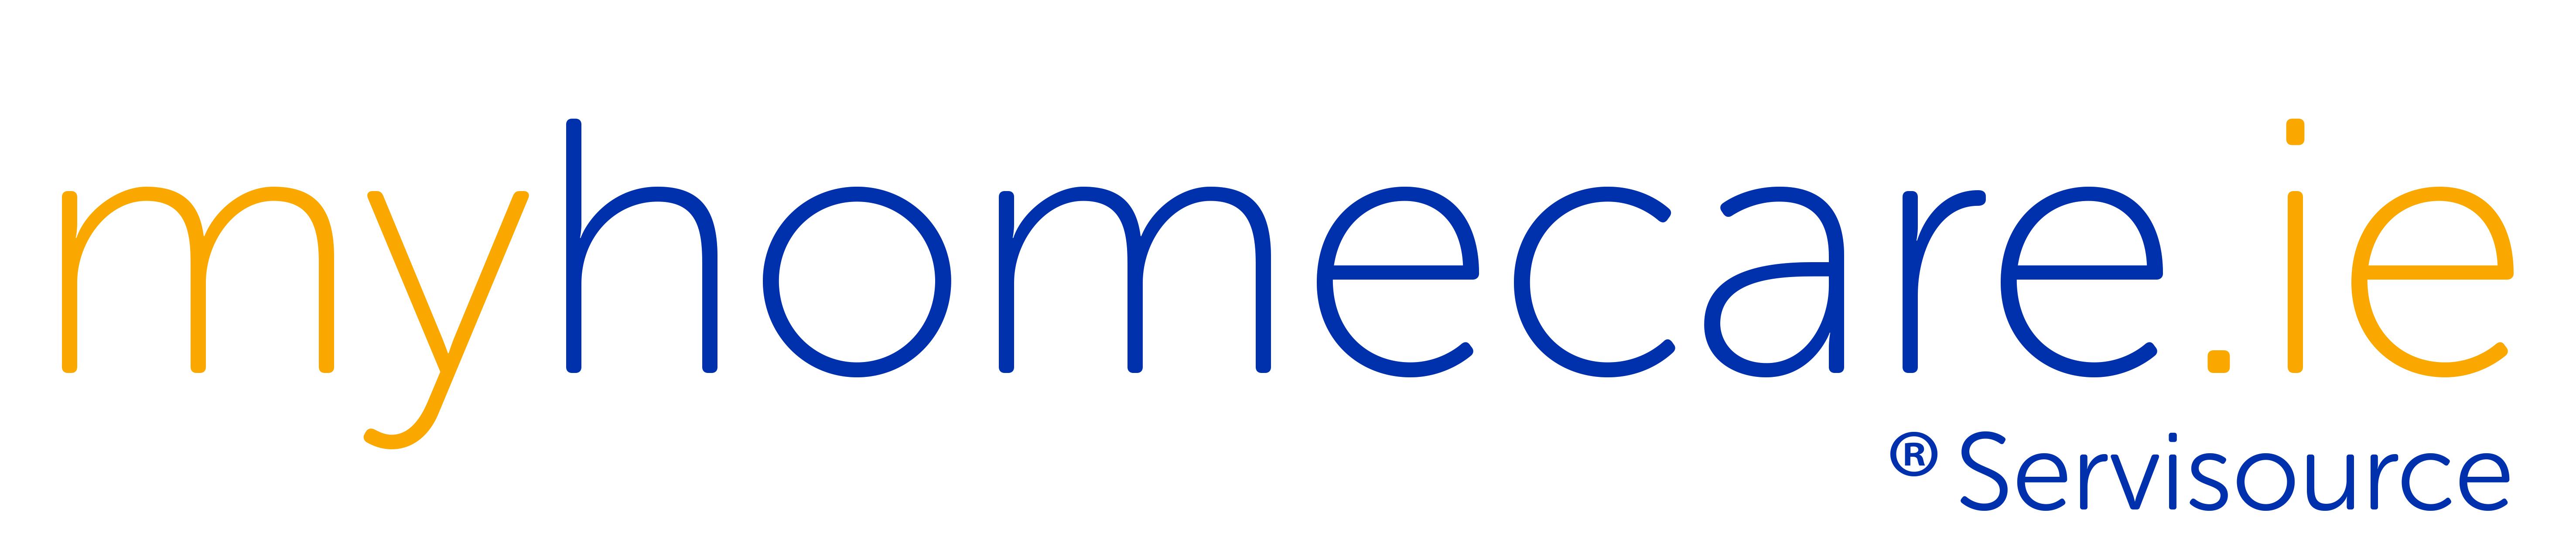 myhomecare-newtestlogo-with-tm-symbol.jpg